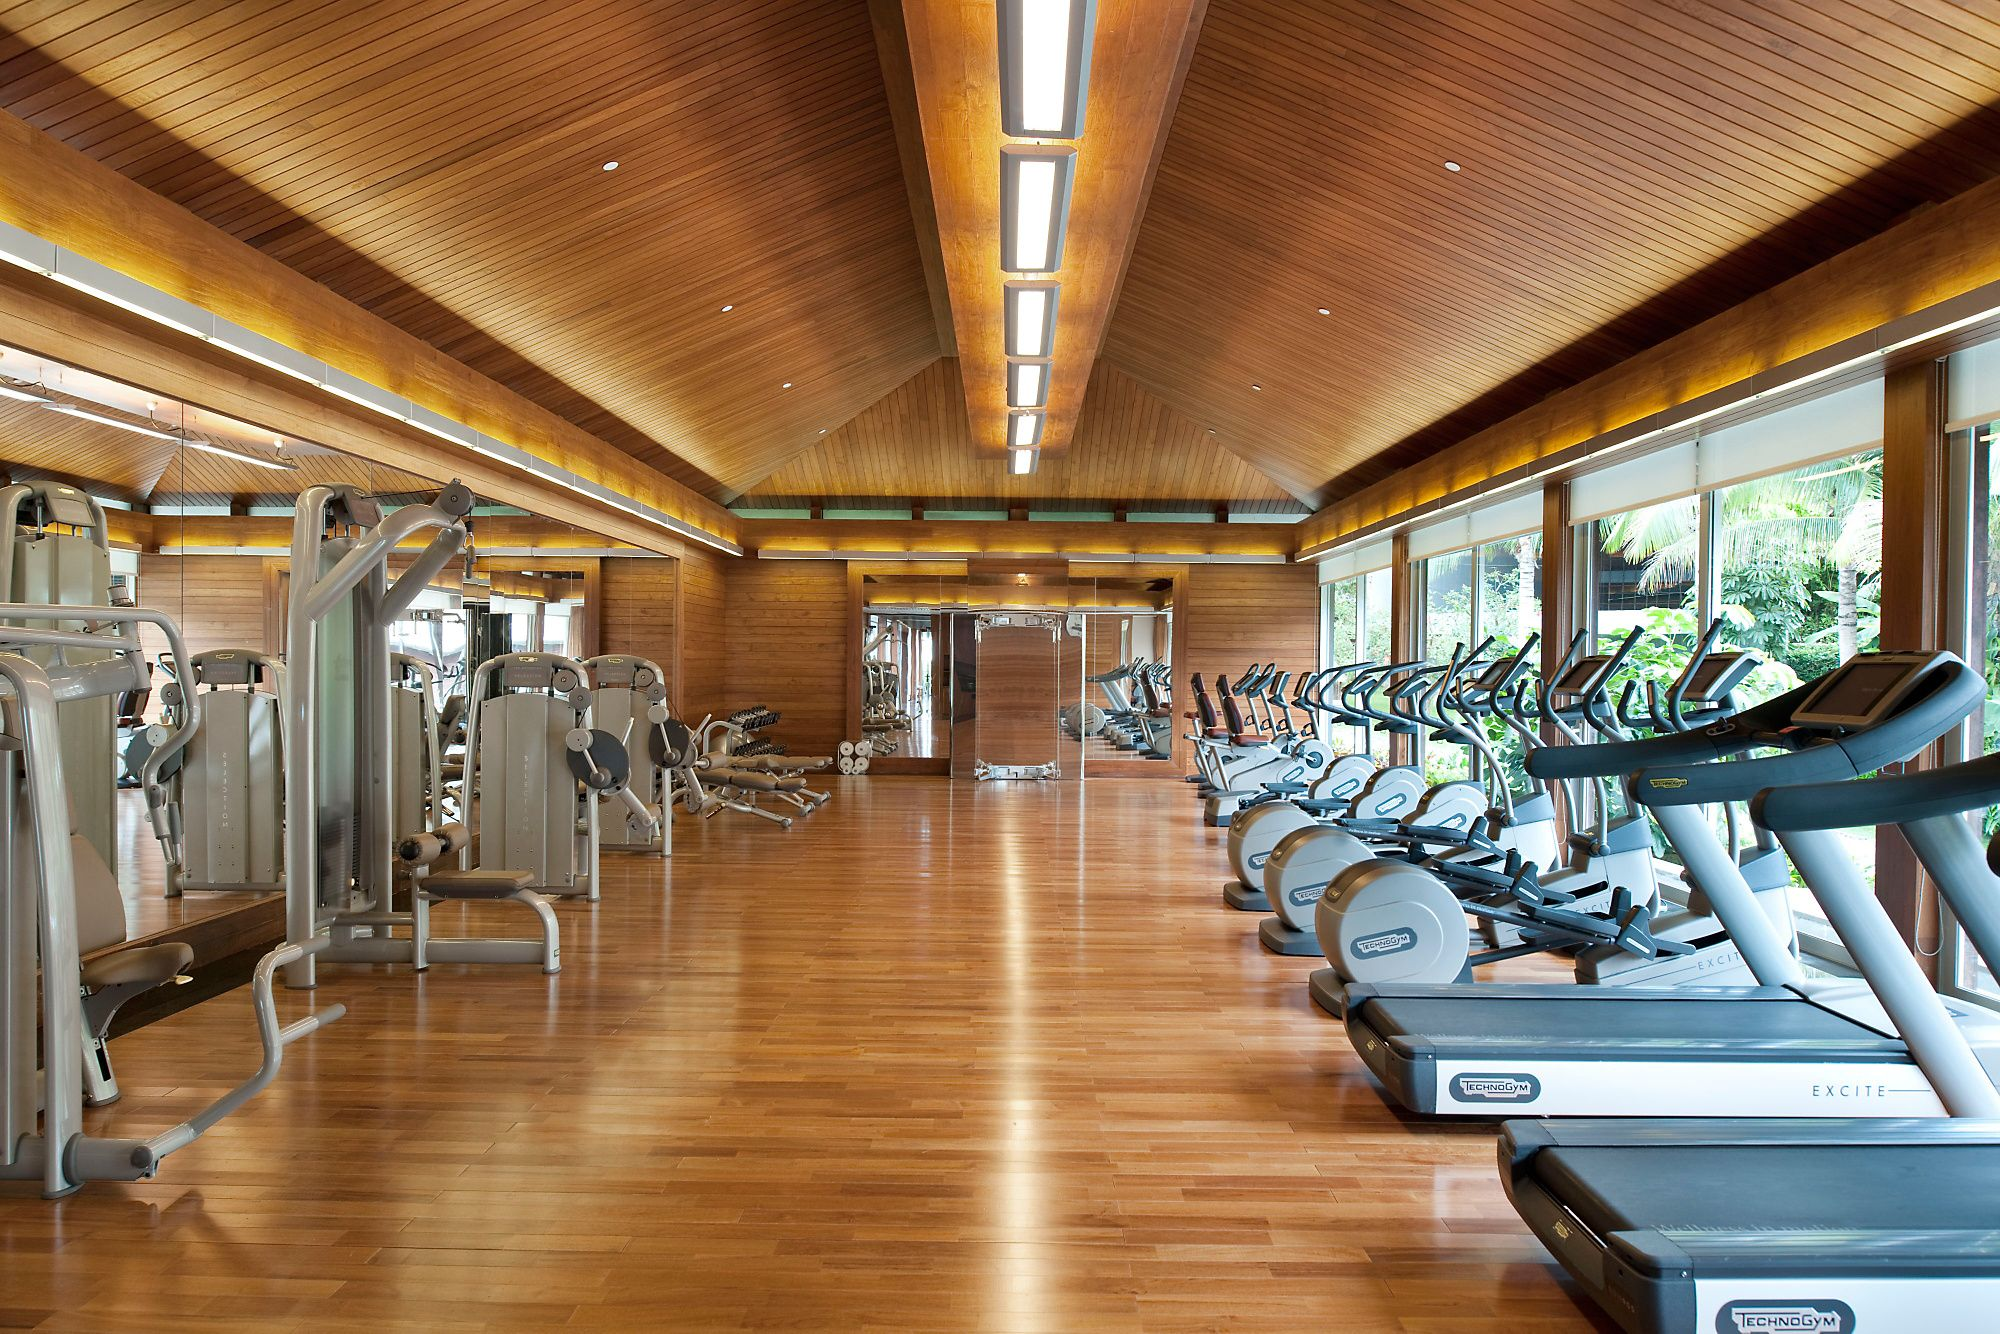 Sportschool ijsselmonde fitness sportschool informatie for Hotel club decor